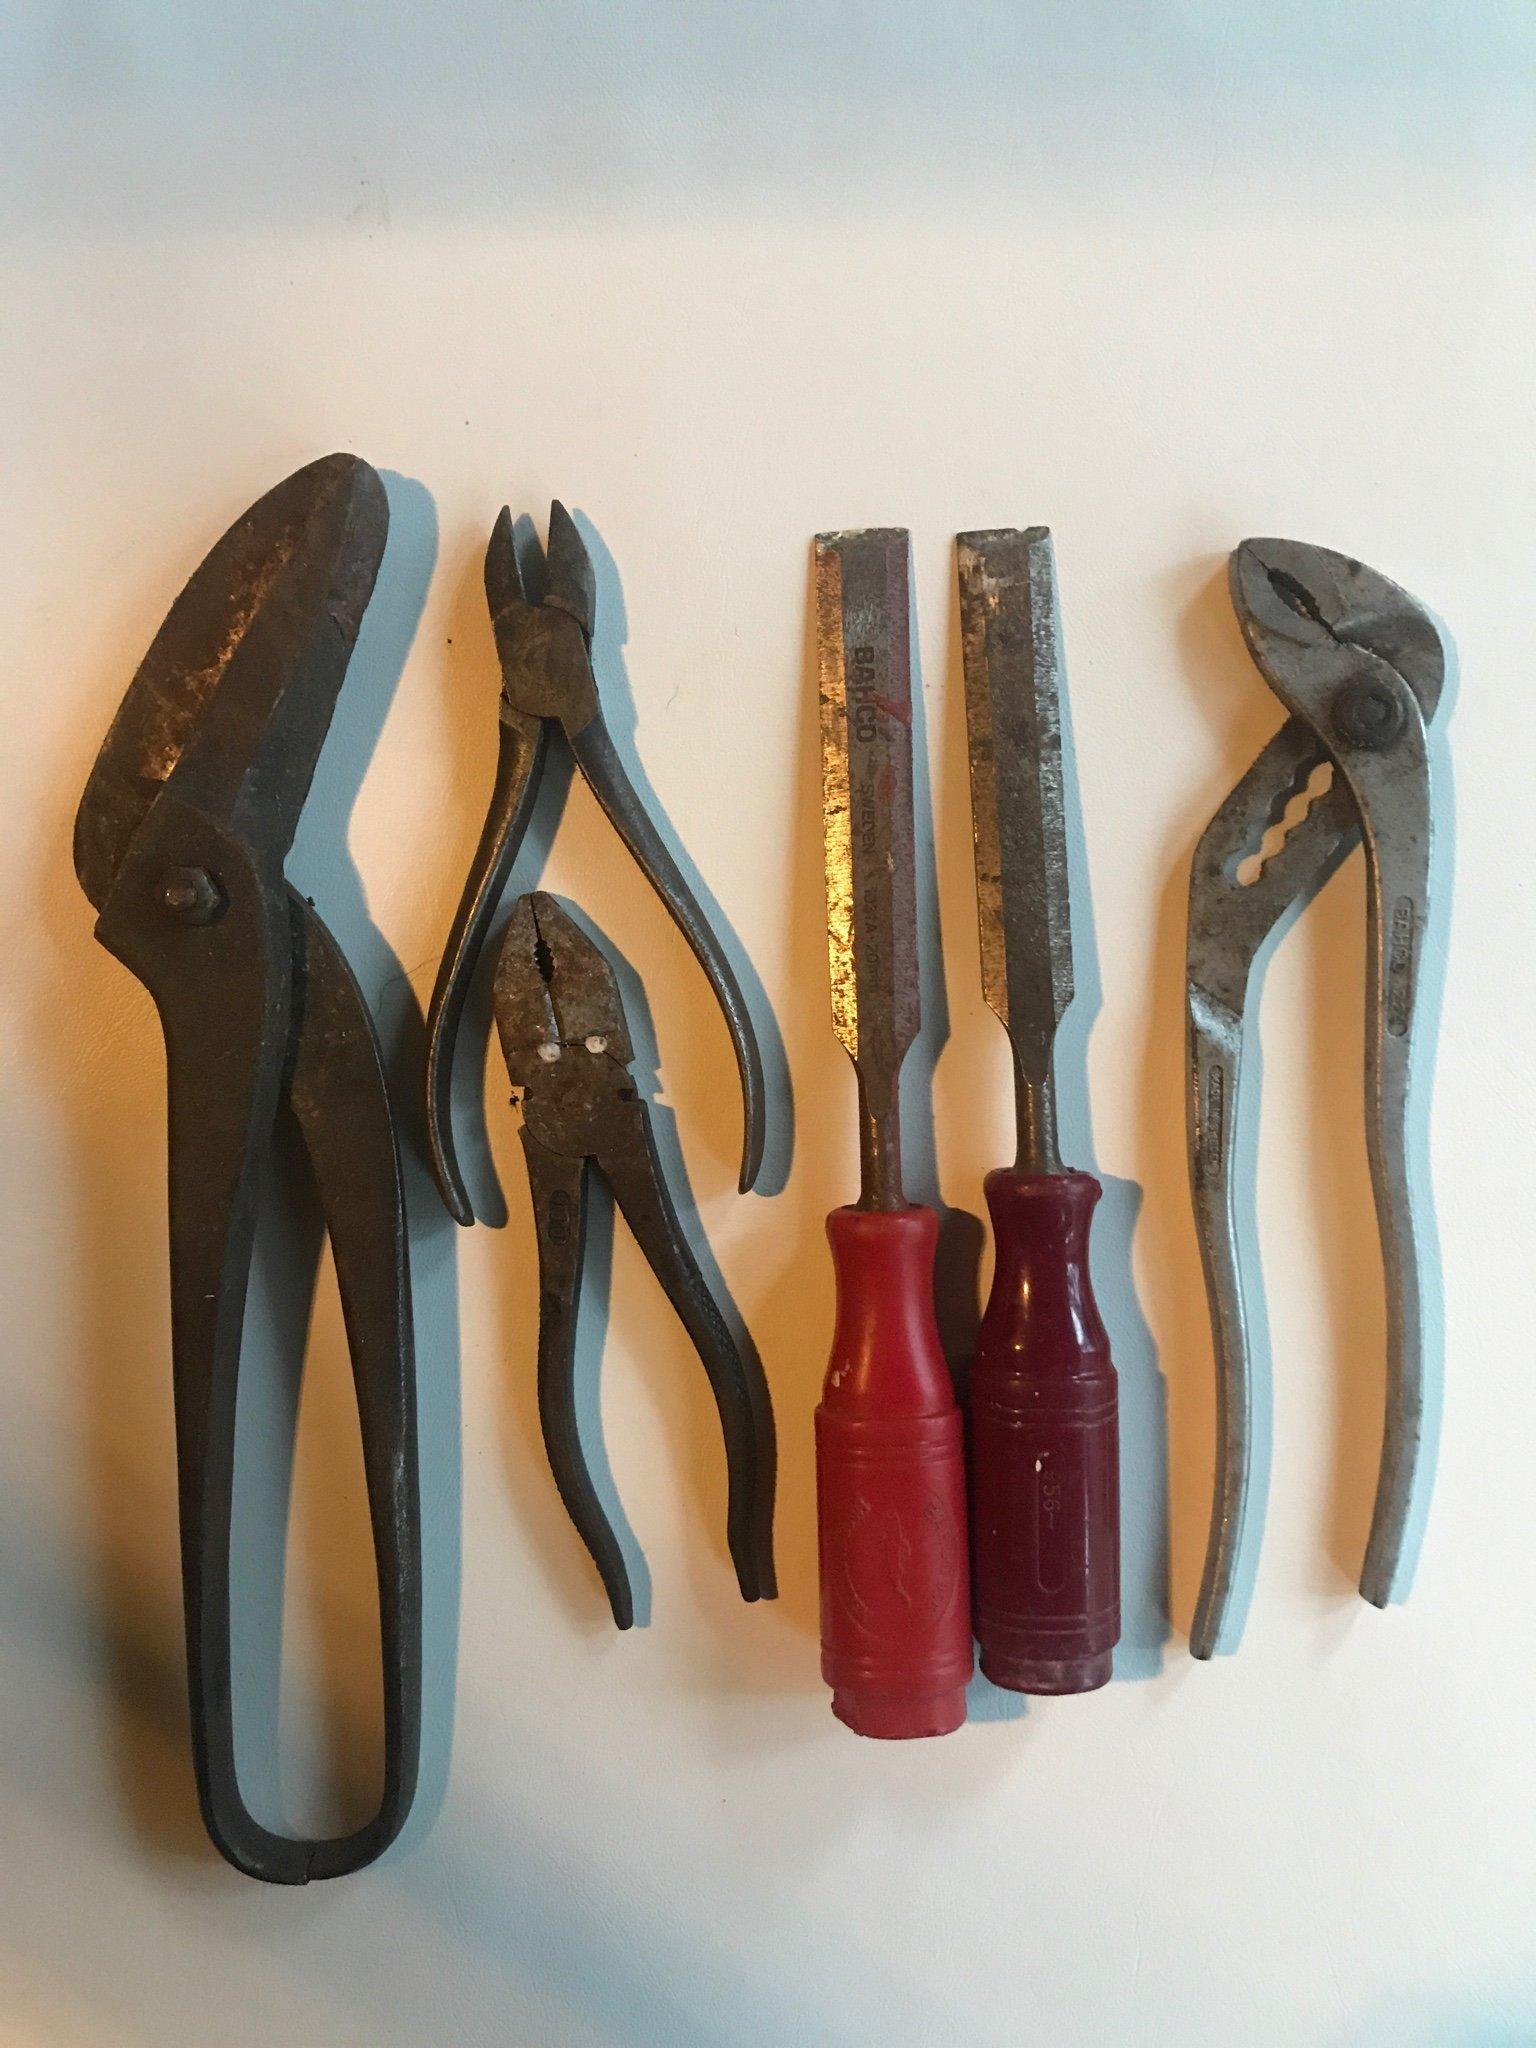 Vintage Eskilstuna Smycken verktyg